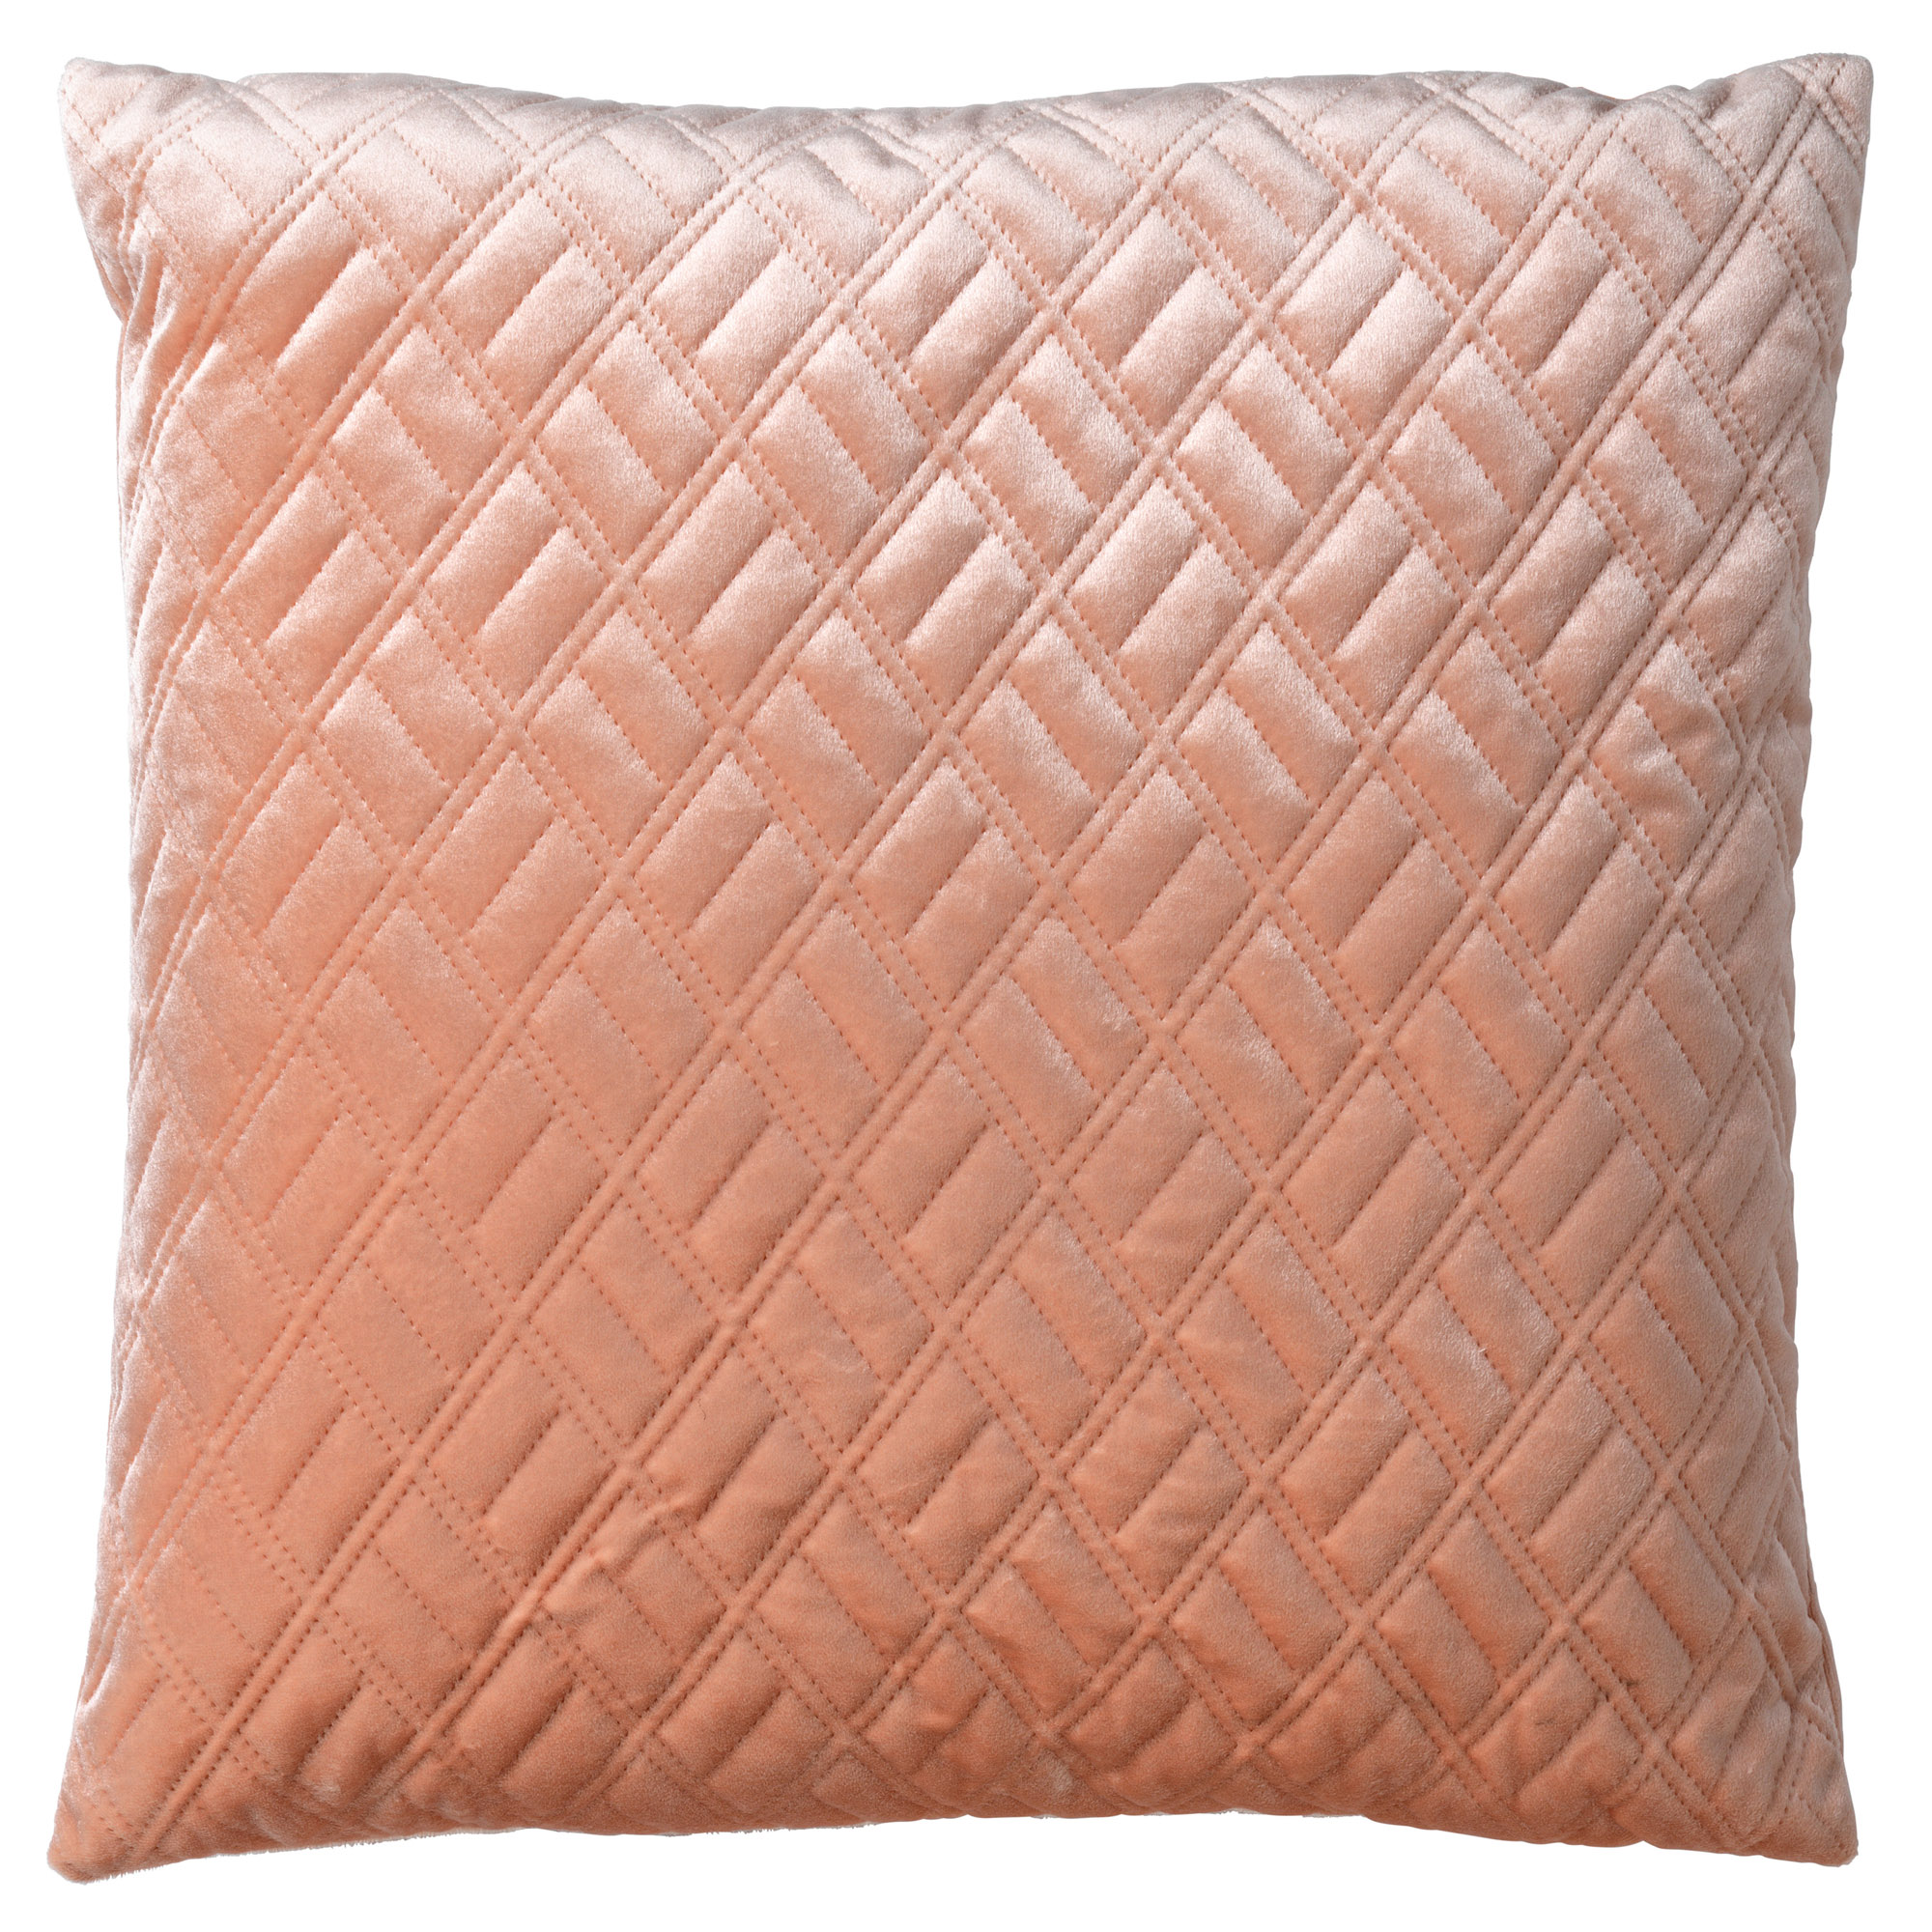 NOVA - Kussenhoes velvet Dusty Pink 45x45 cm